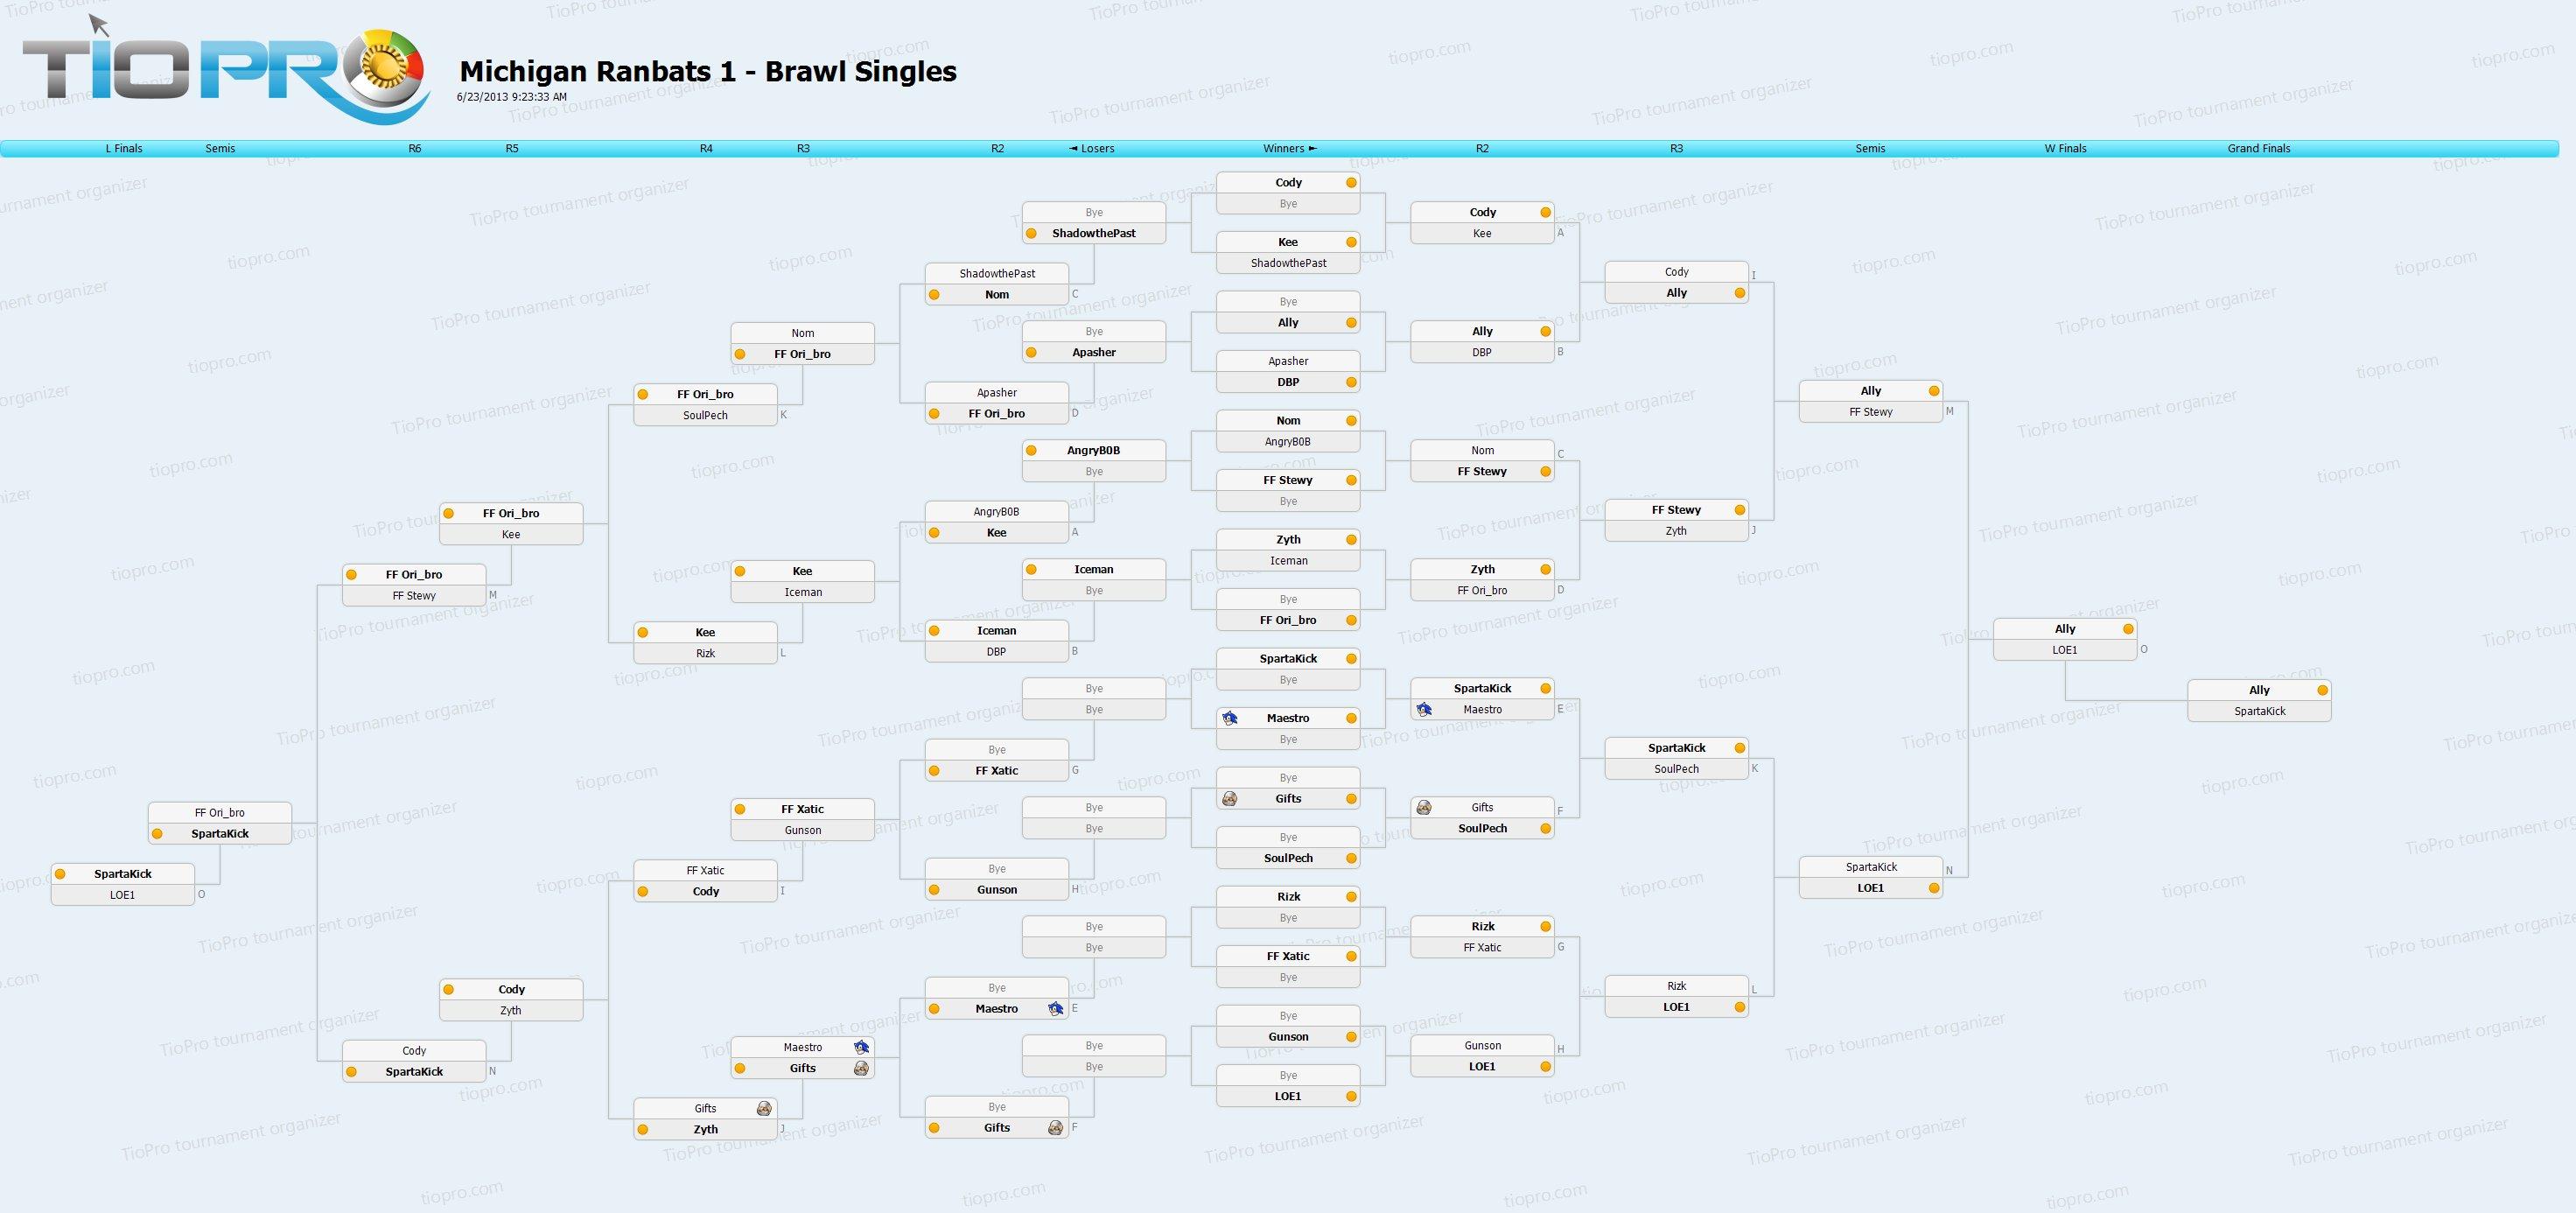 Michigan Ranbats 1 - Brawl Singles